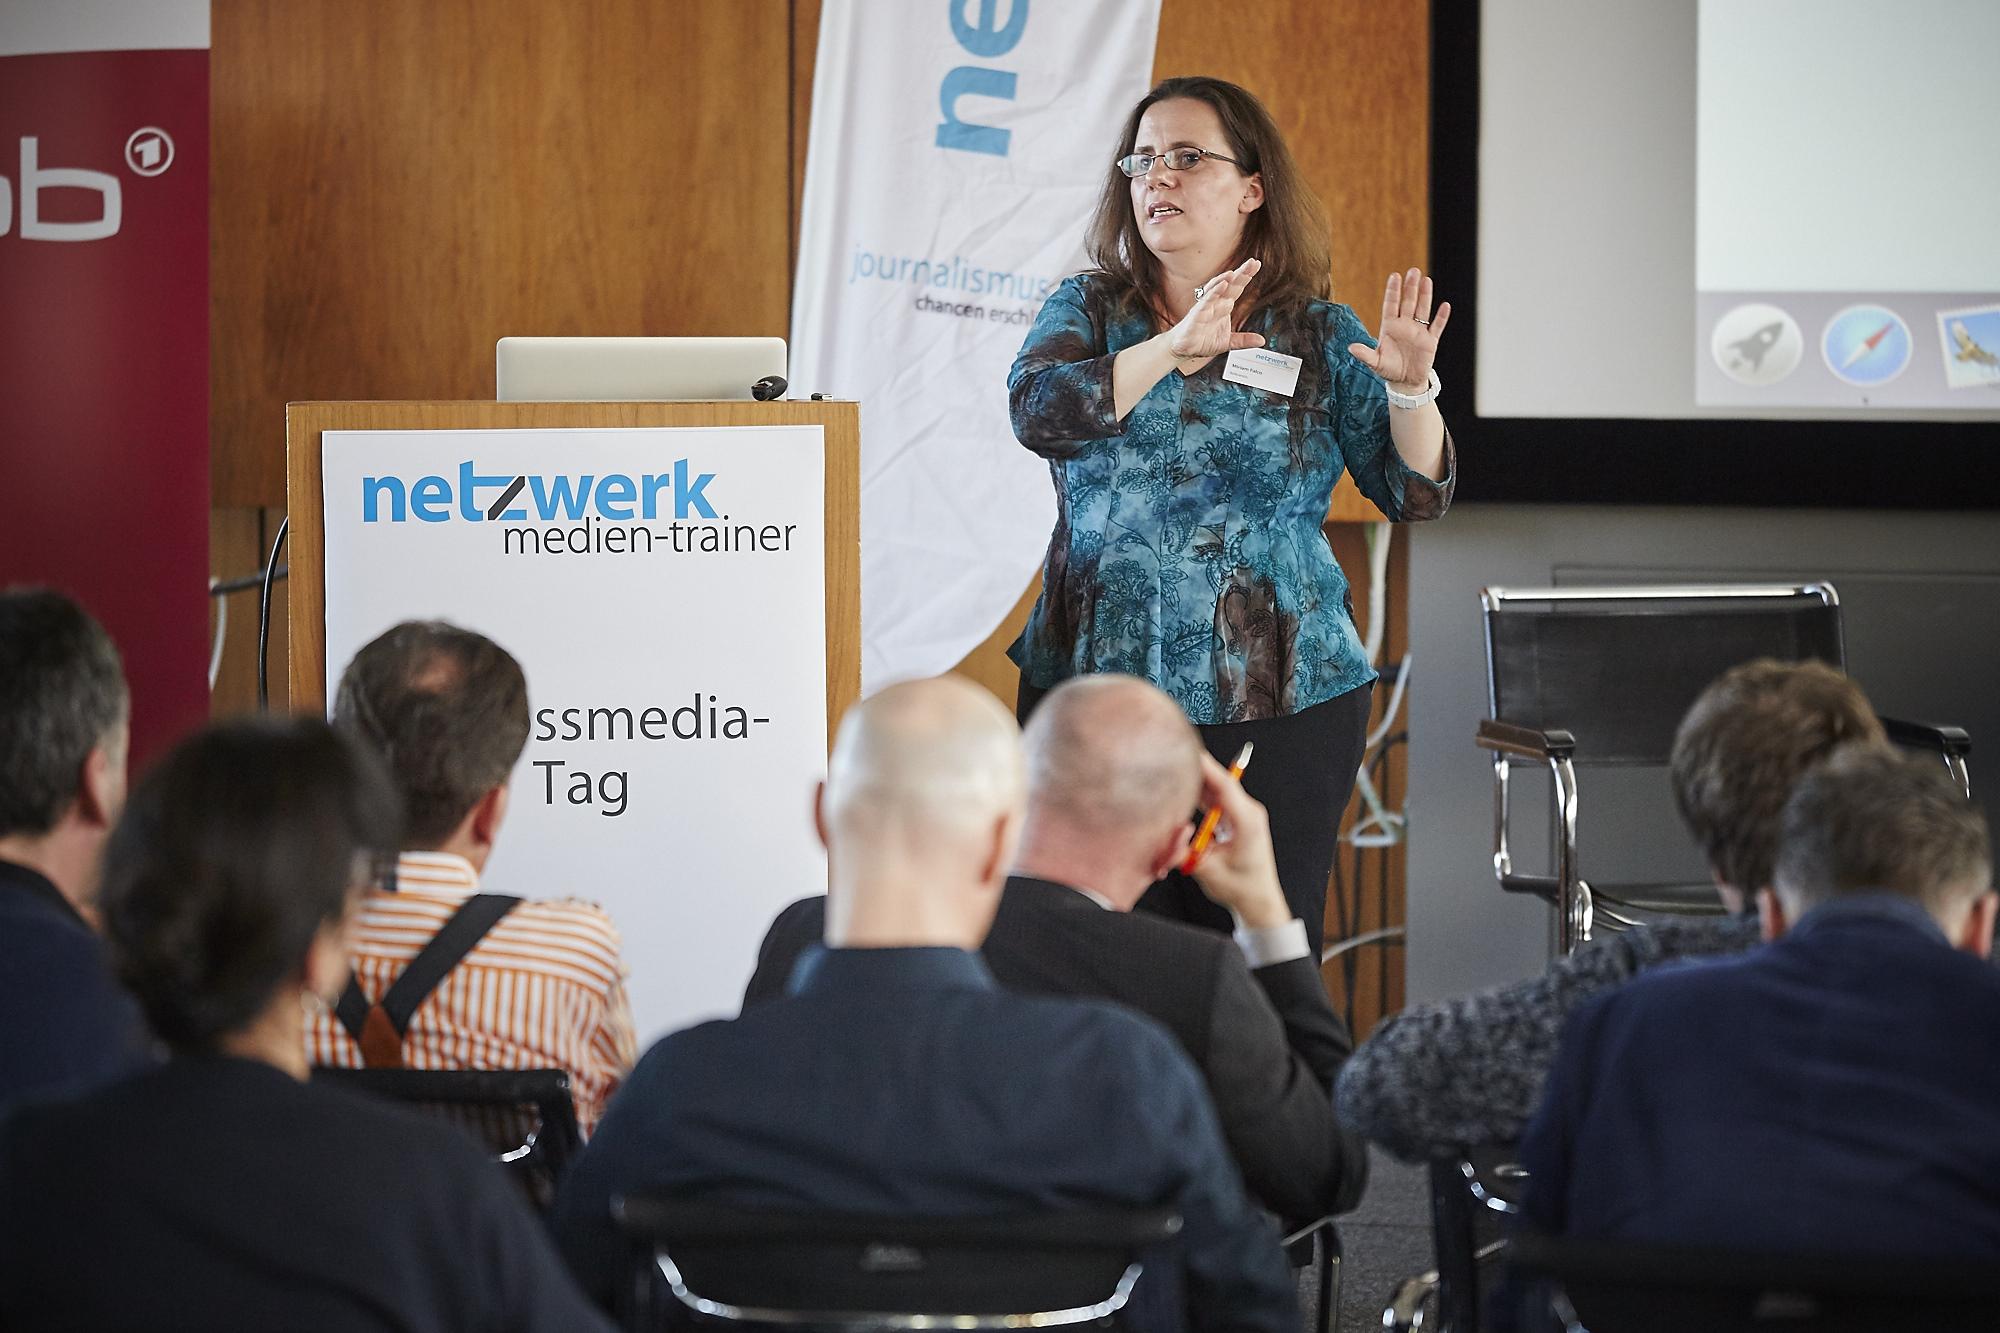 Miriam Falco auf dem Crossmedia-Tag des netzwerk medien-trainer